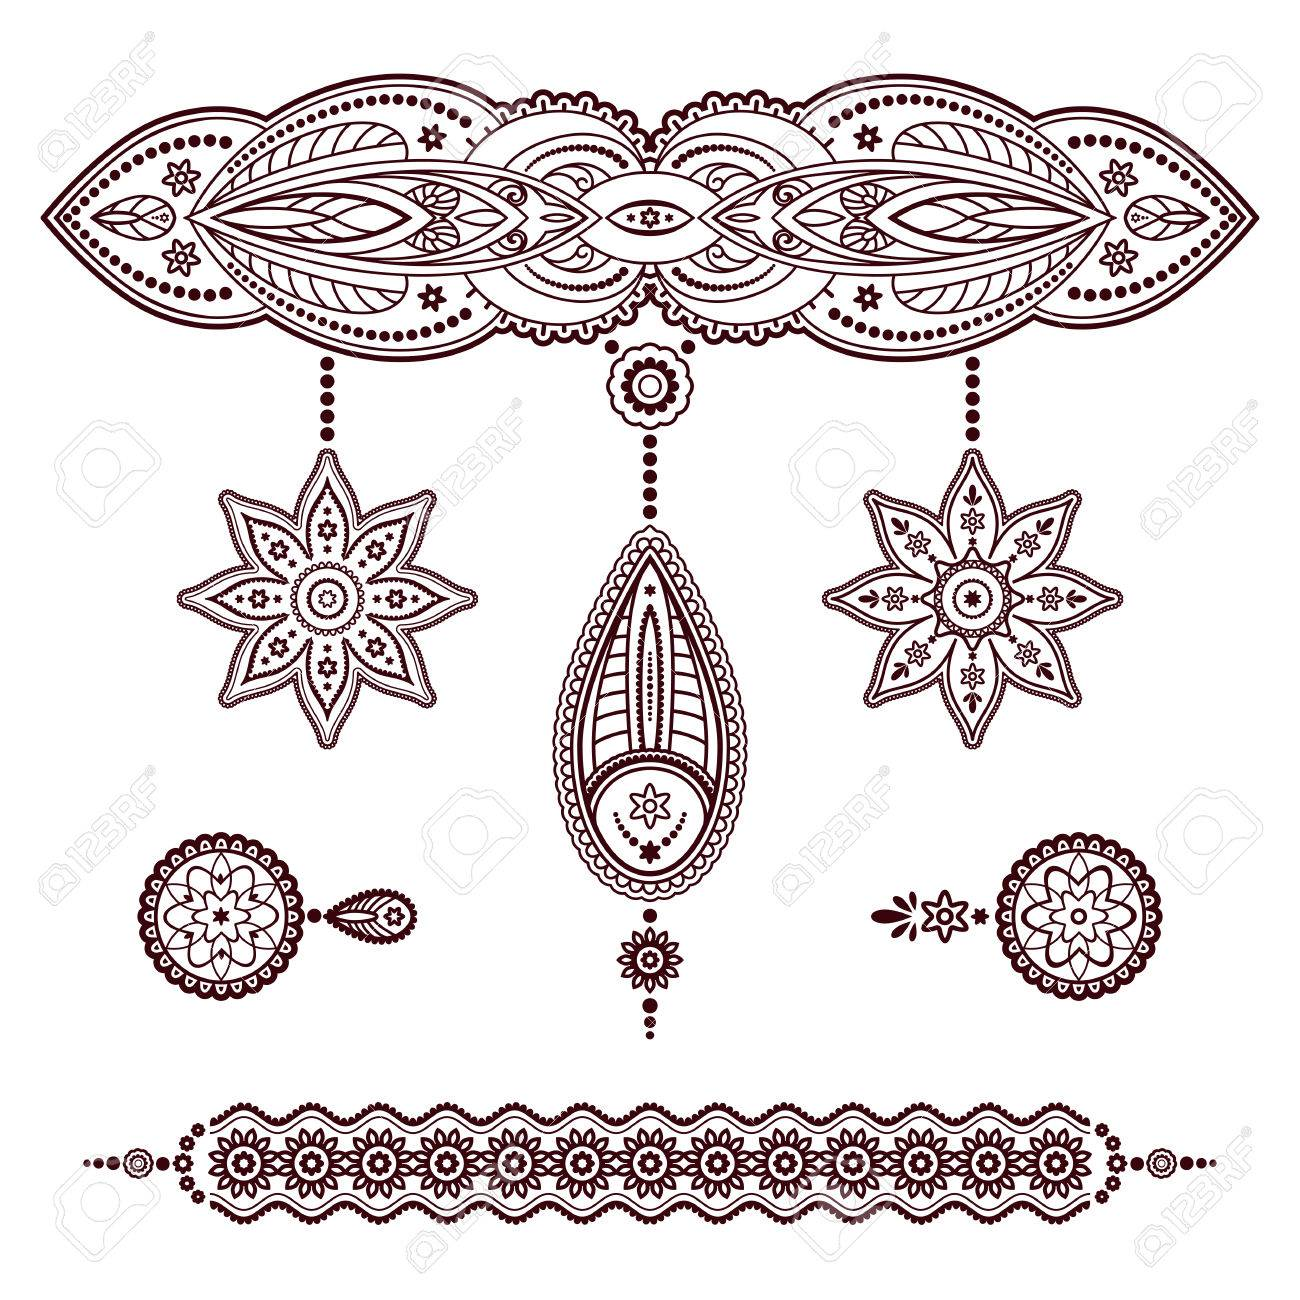 Set Of Henna Tattoo Templates, Decorative Doodle Elements, Pendant ...